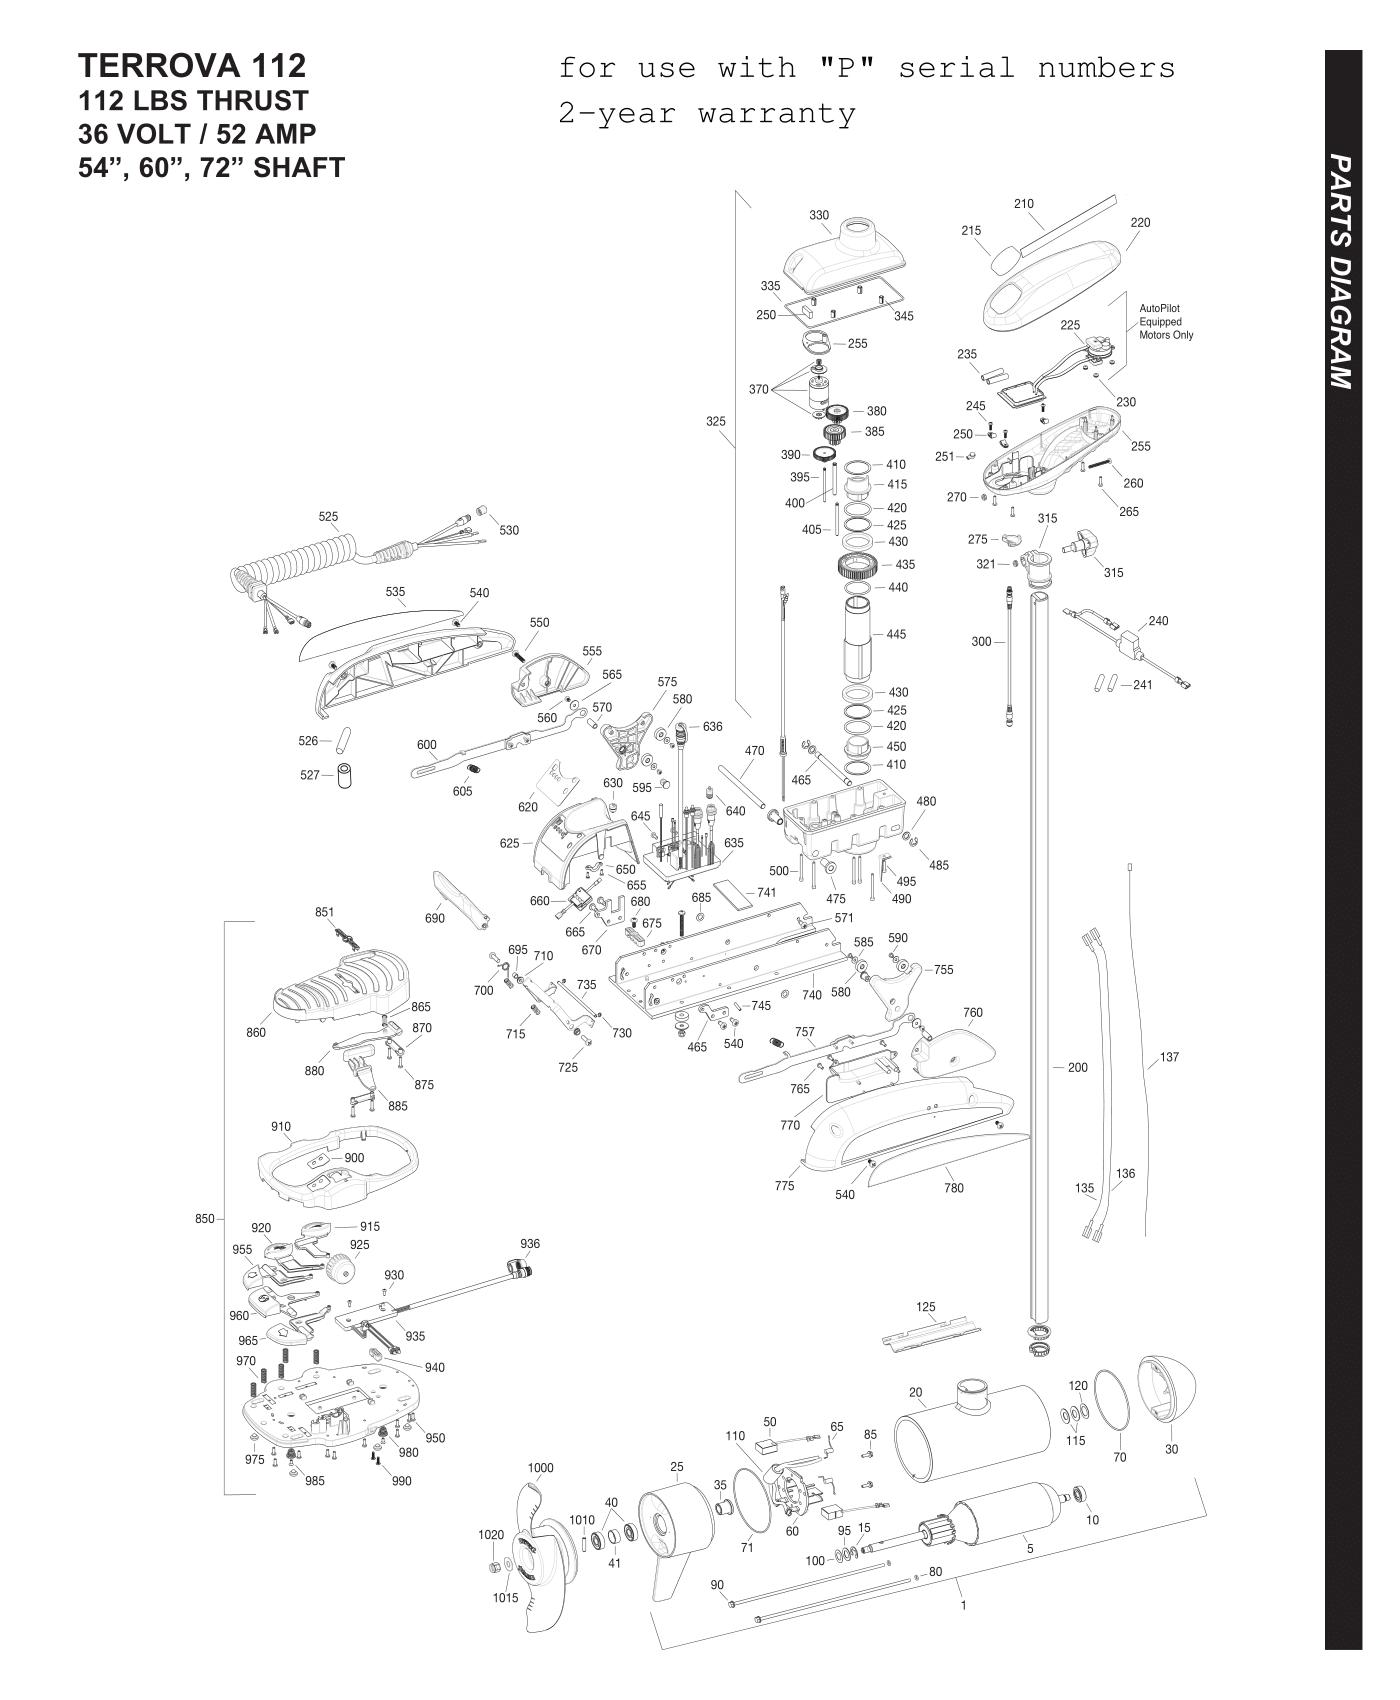 2015-mk-terrova112-1.png